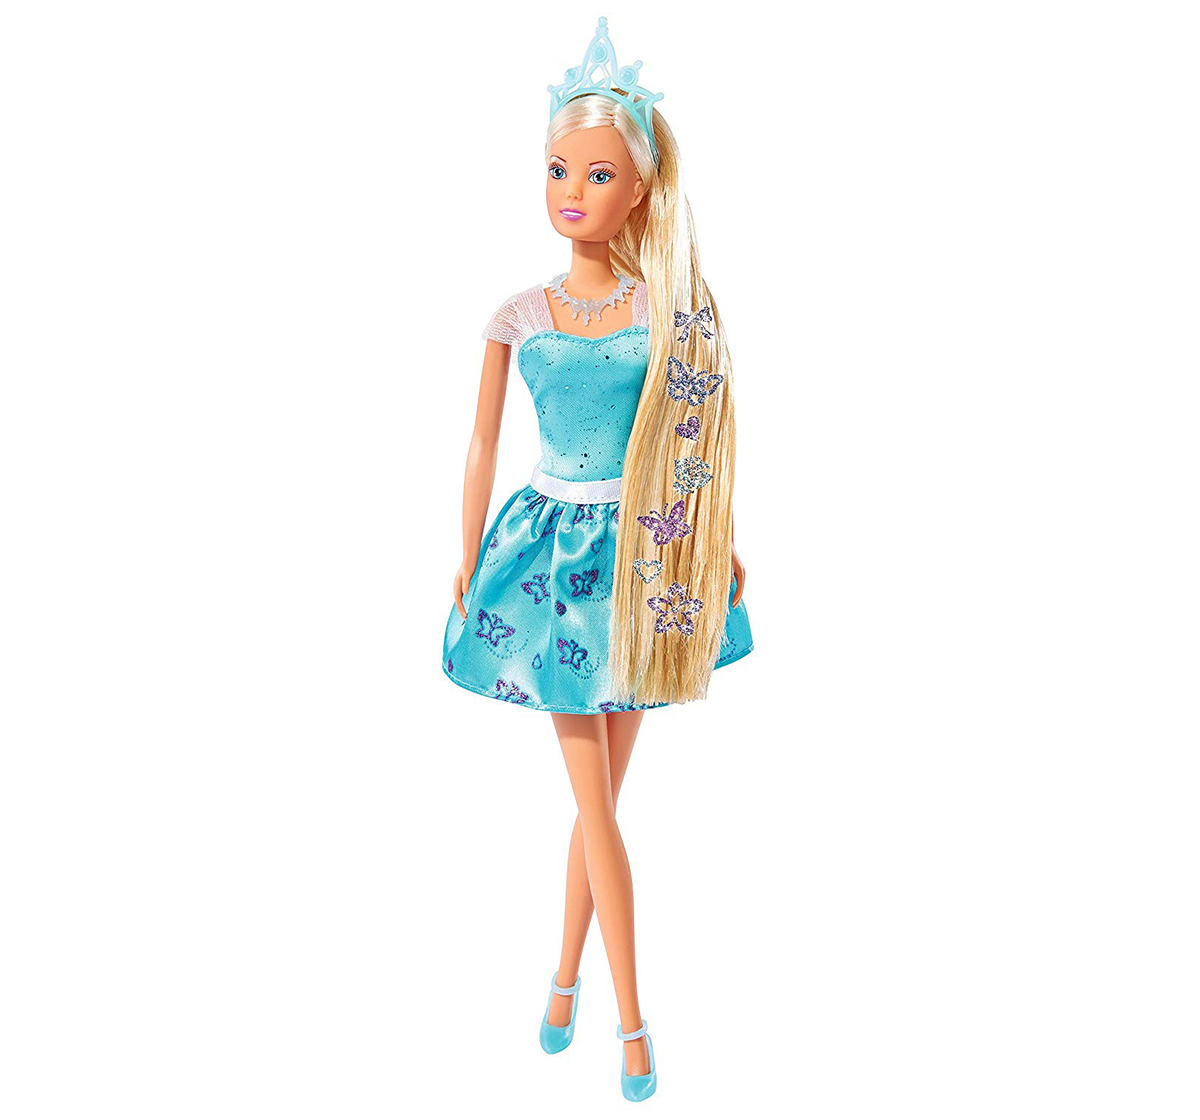 Steffi Love | Steffi Love - Hair Tattoo Princess, Blue Dolls & Accessories for Girls age 3Y+ (Blue)